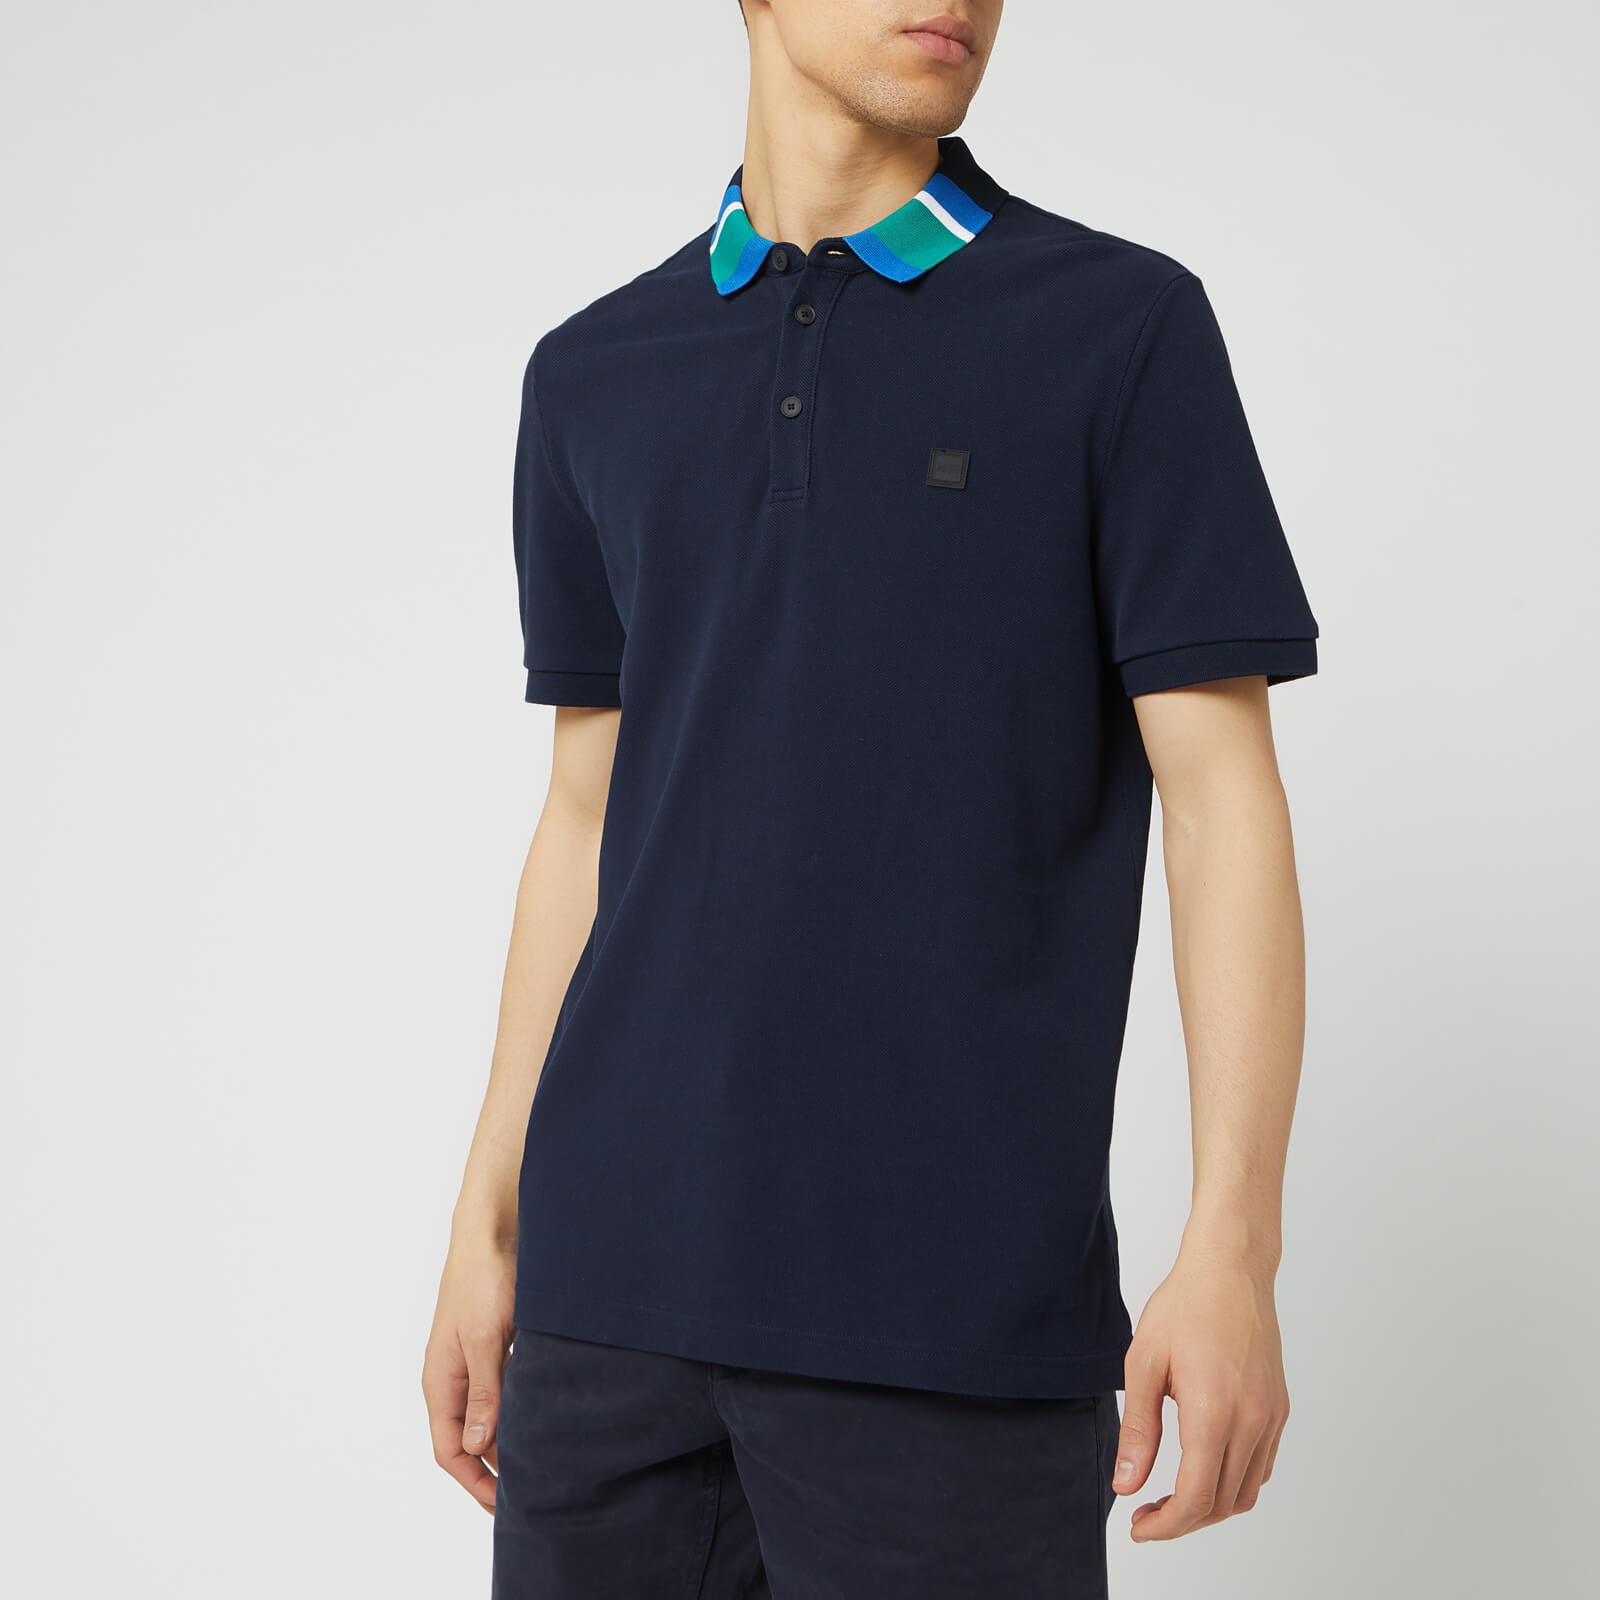 cce3cc7a2 BOSS Men's Polarized Polo Shirt - Dark Blue Clothing | TheHut.com